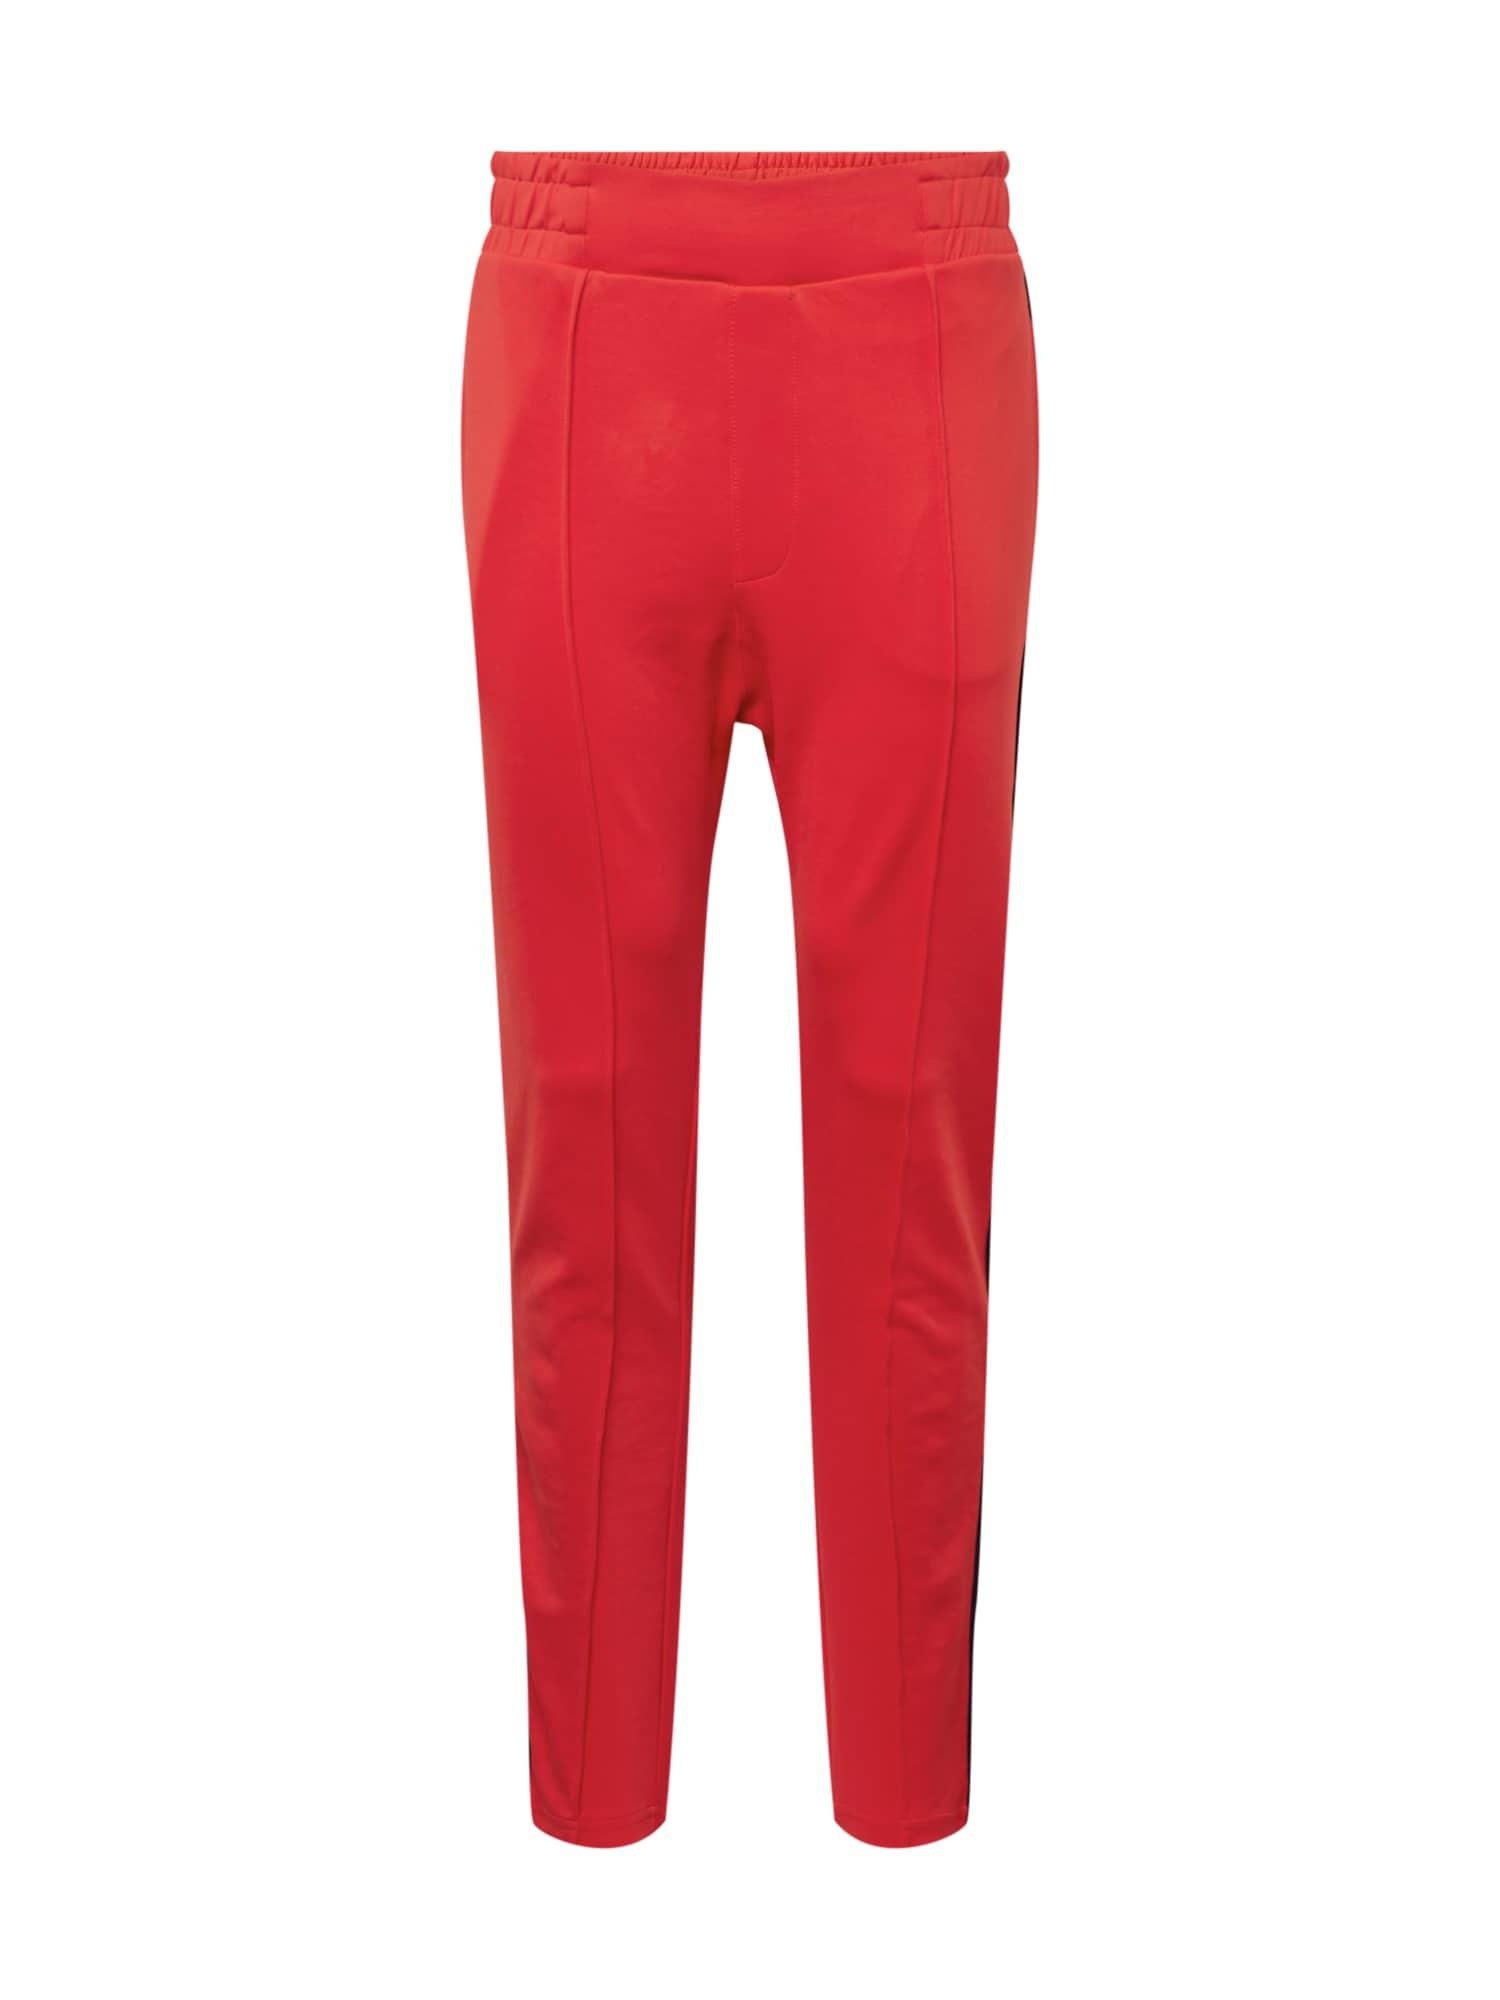 TOM TAILOR DENIM Kalhoty  červená